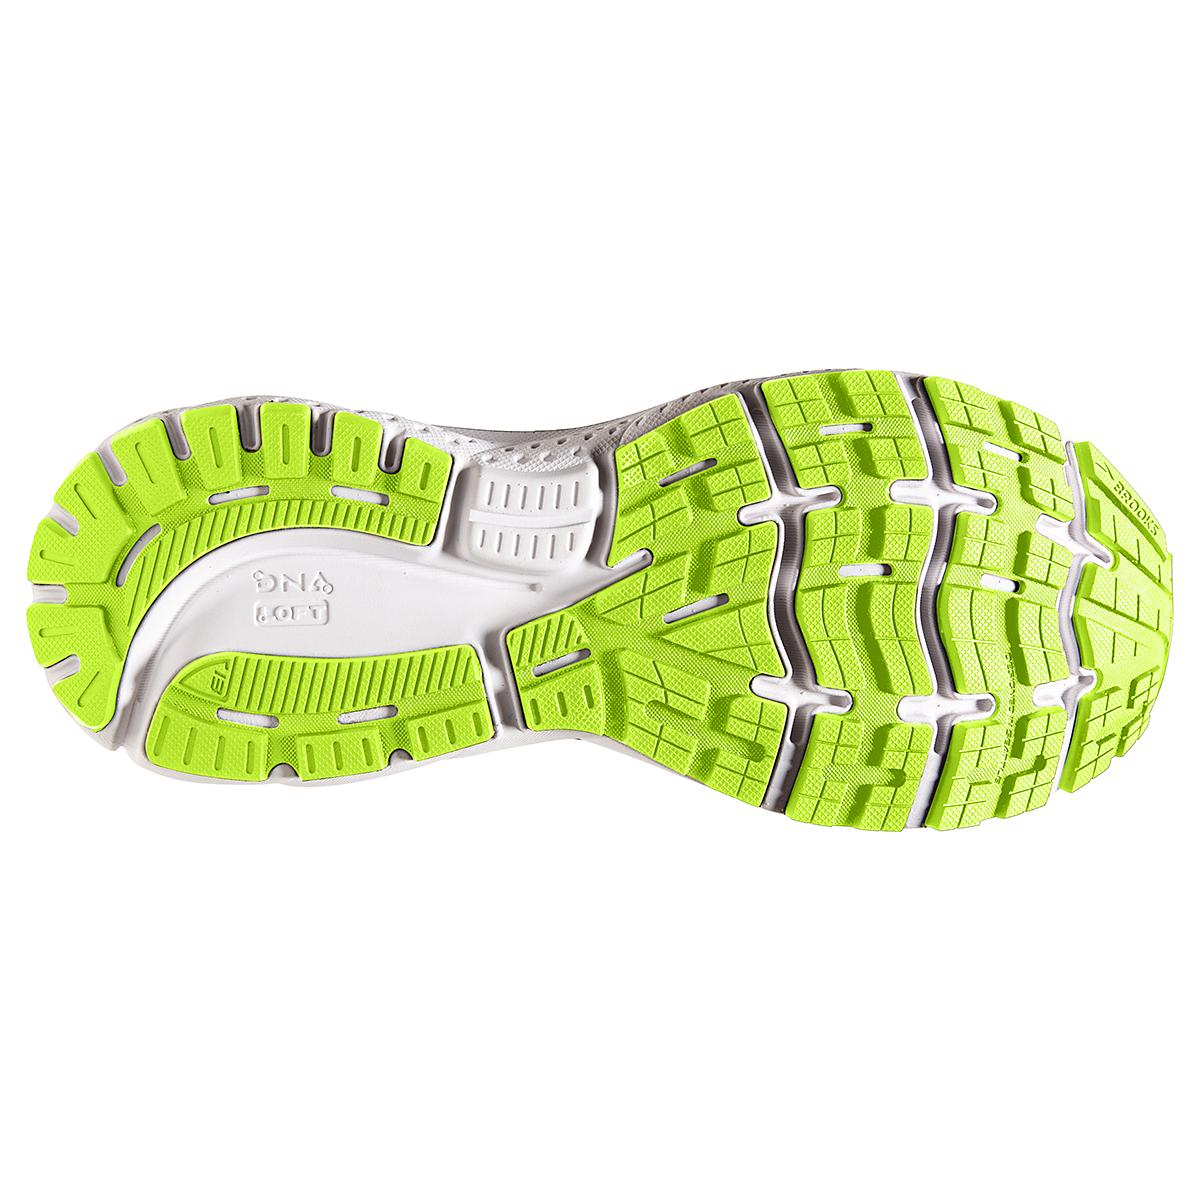 Men's Brooks Ghost 13 Running Shoe - Color: Black/Nightlife/White - Size: 7 - Width: Regular, Black/Nightlife/White, large, image 4